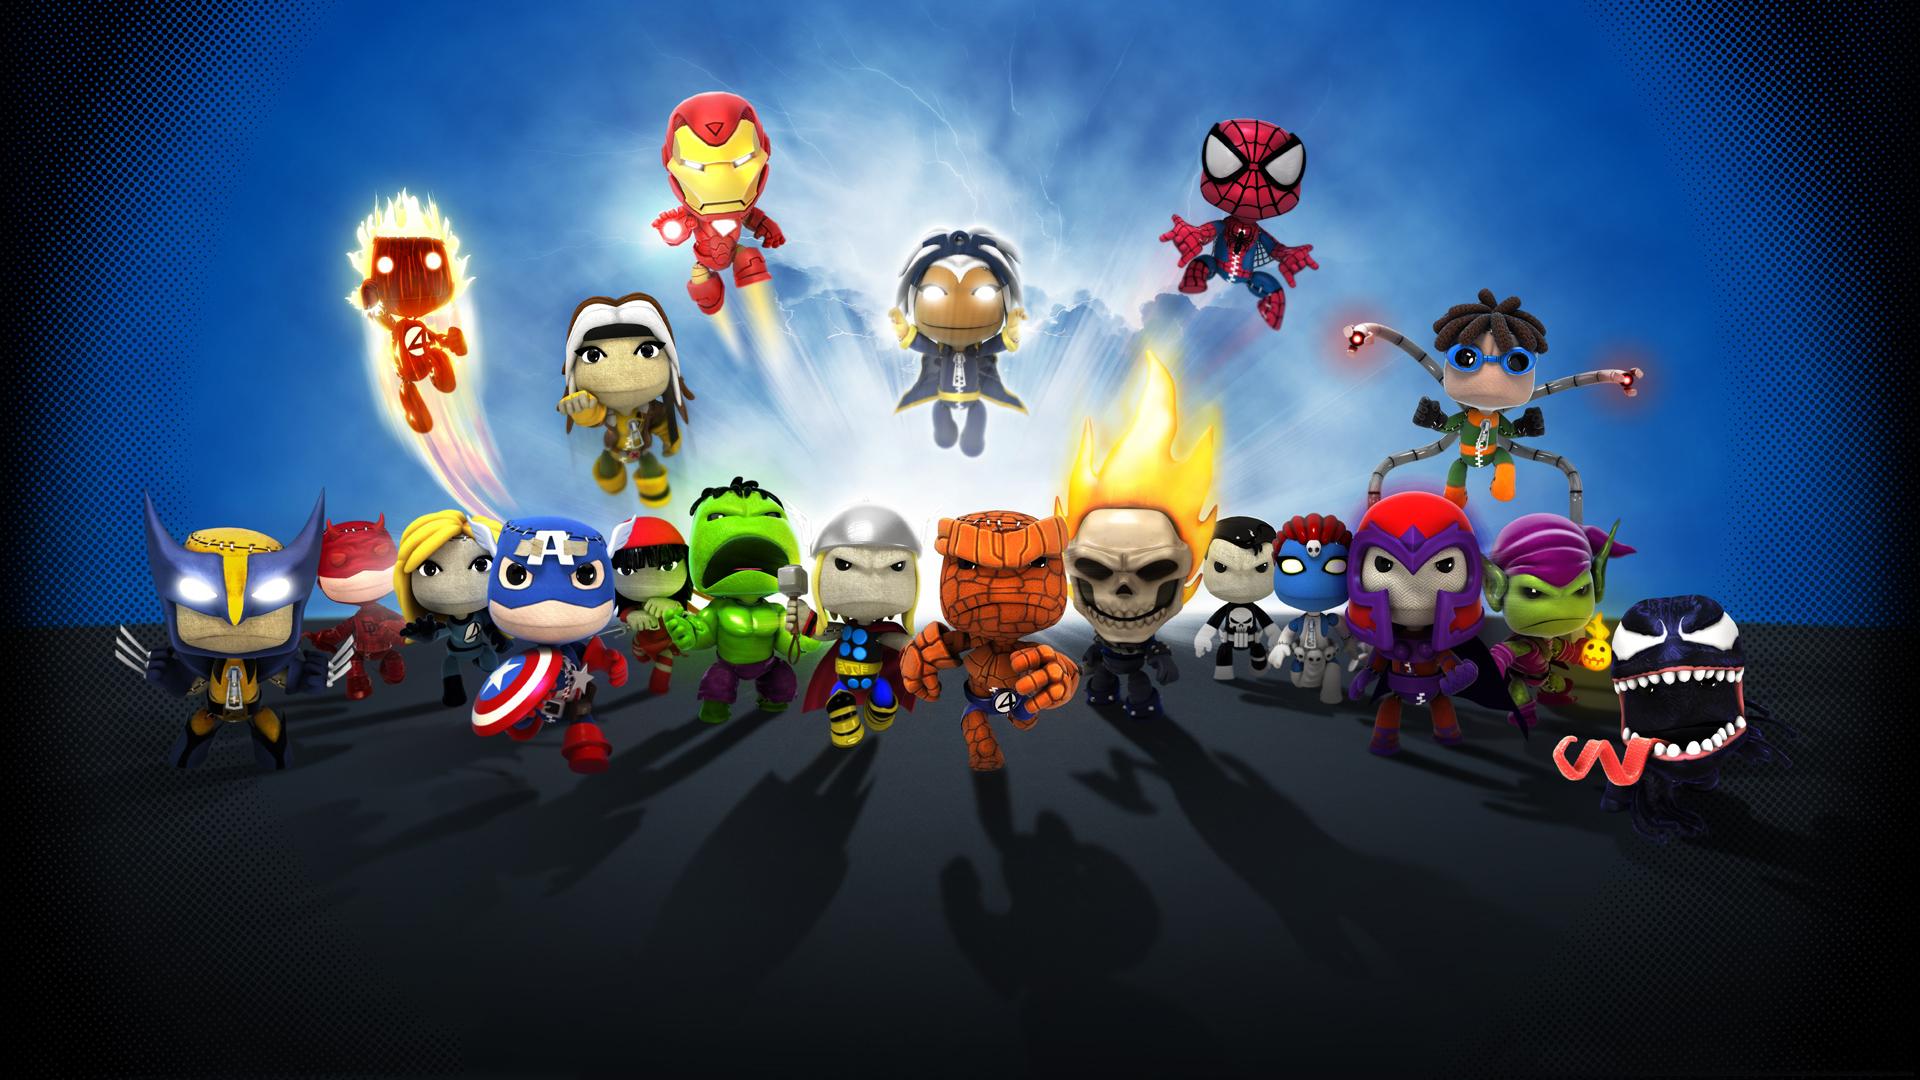 Net Src Superhero Wallpaper